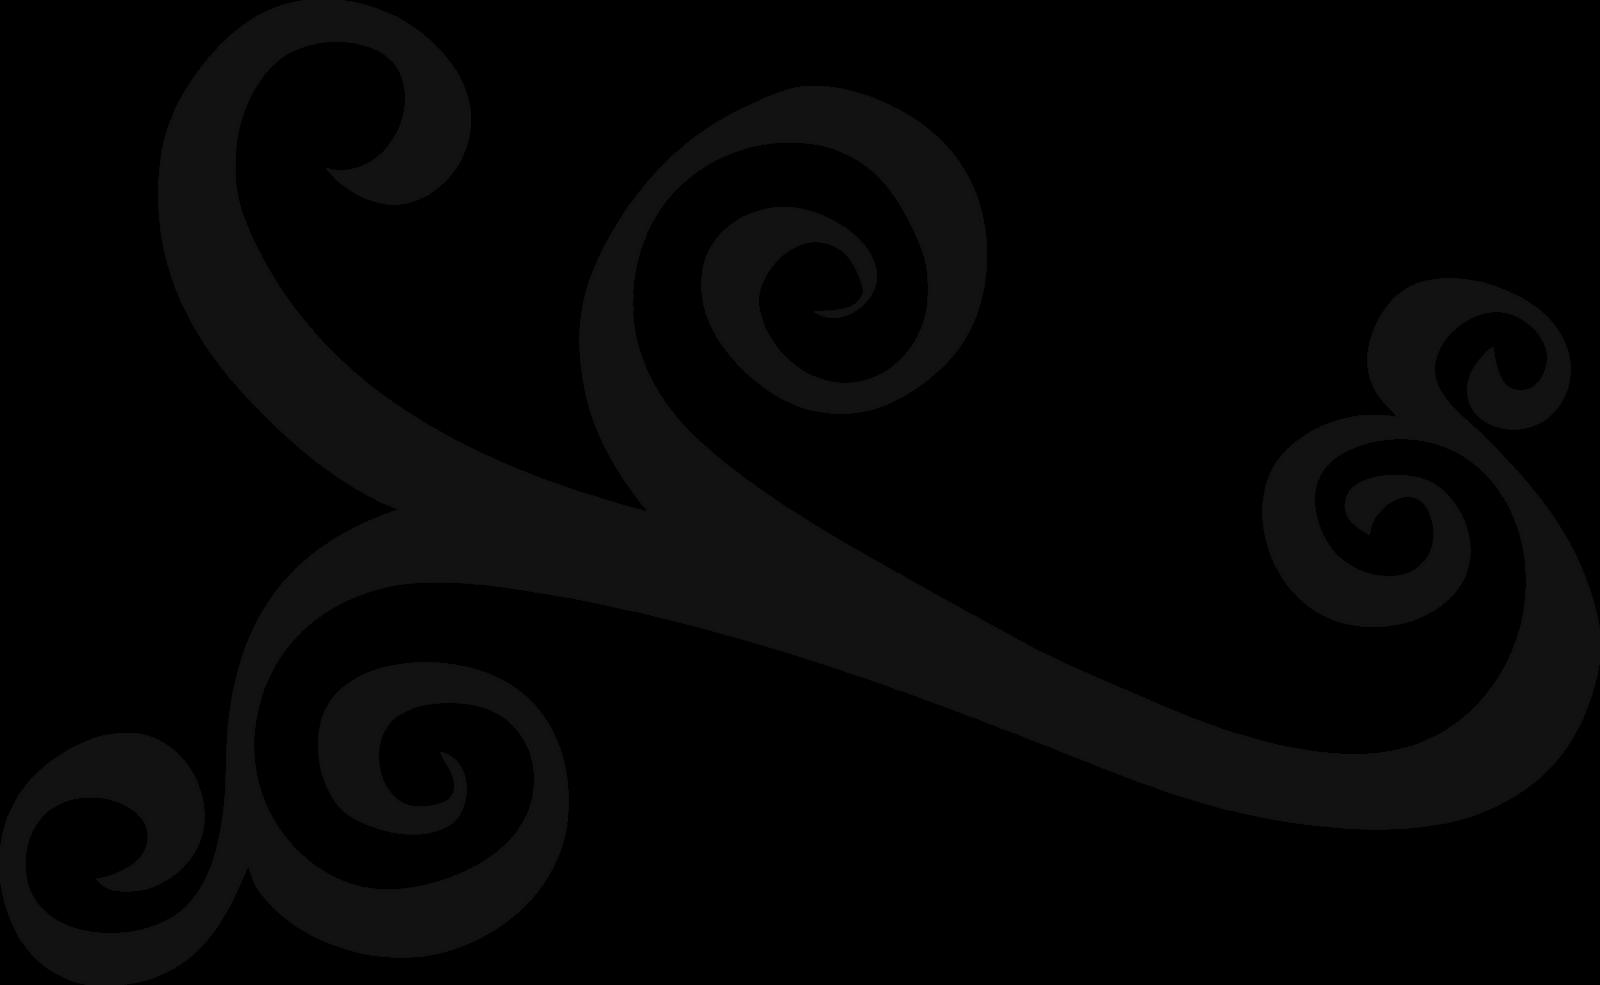 clipart design-clipart design-0